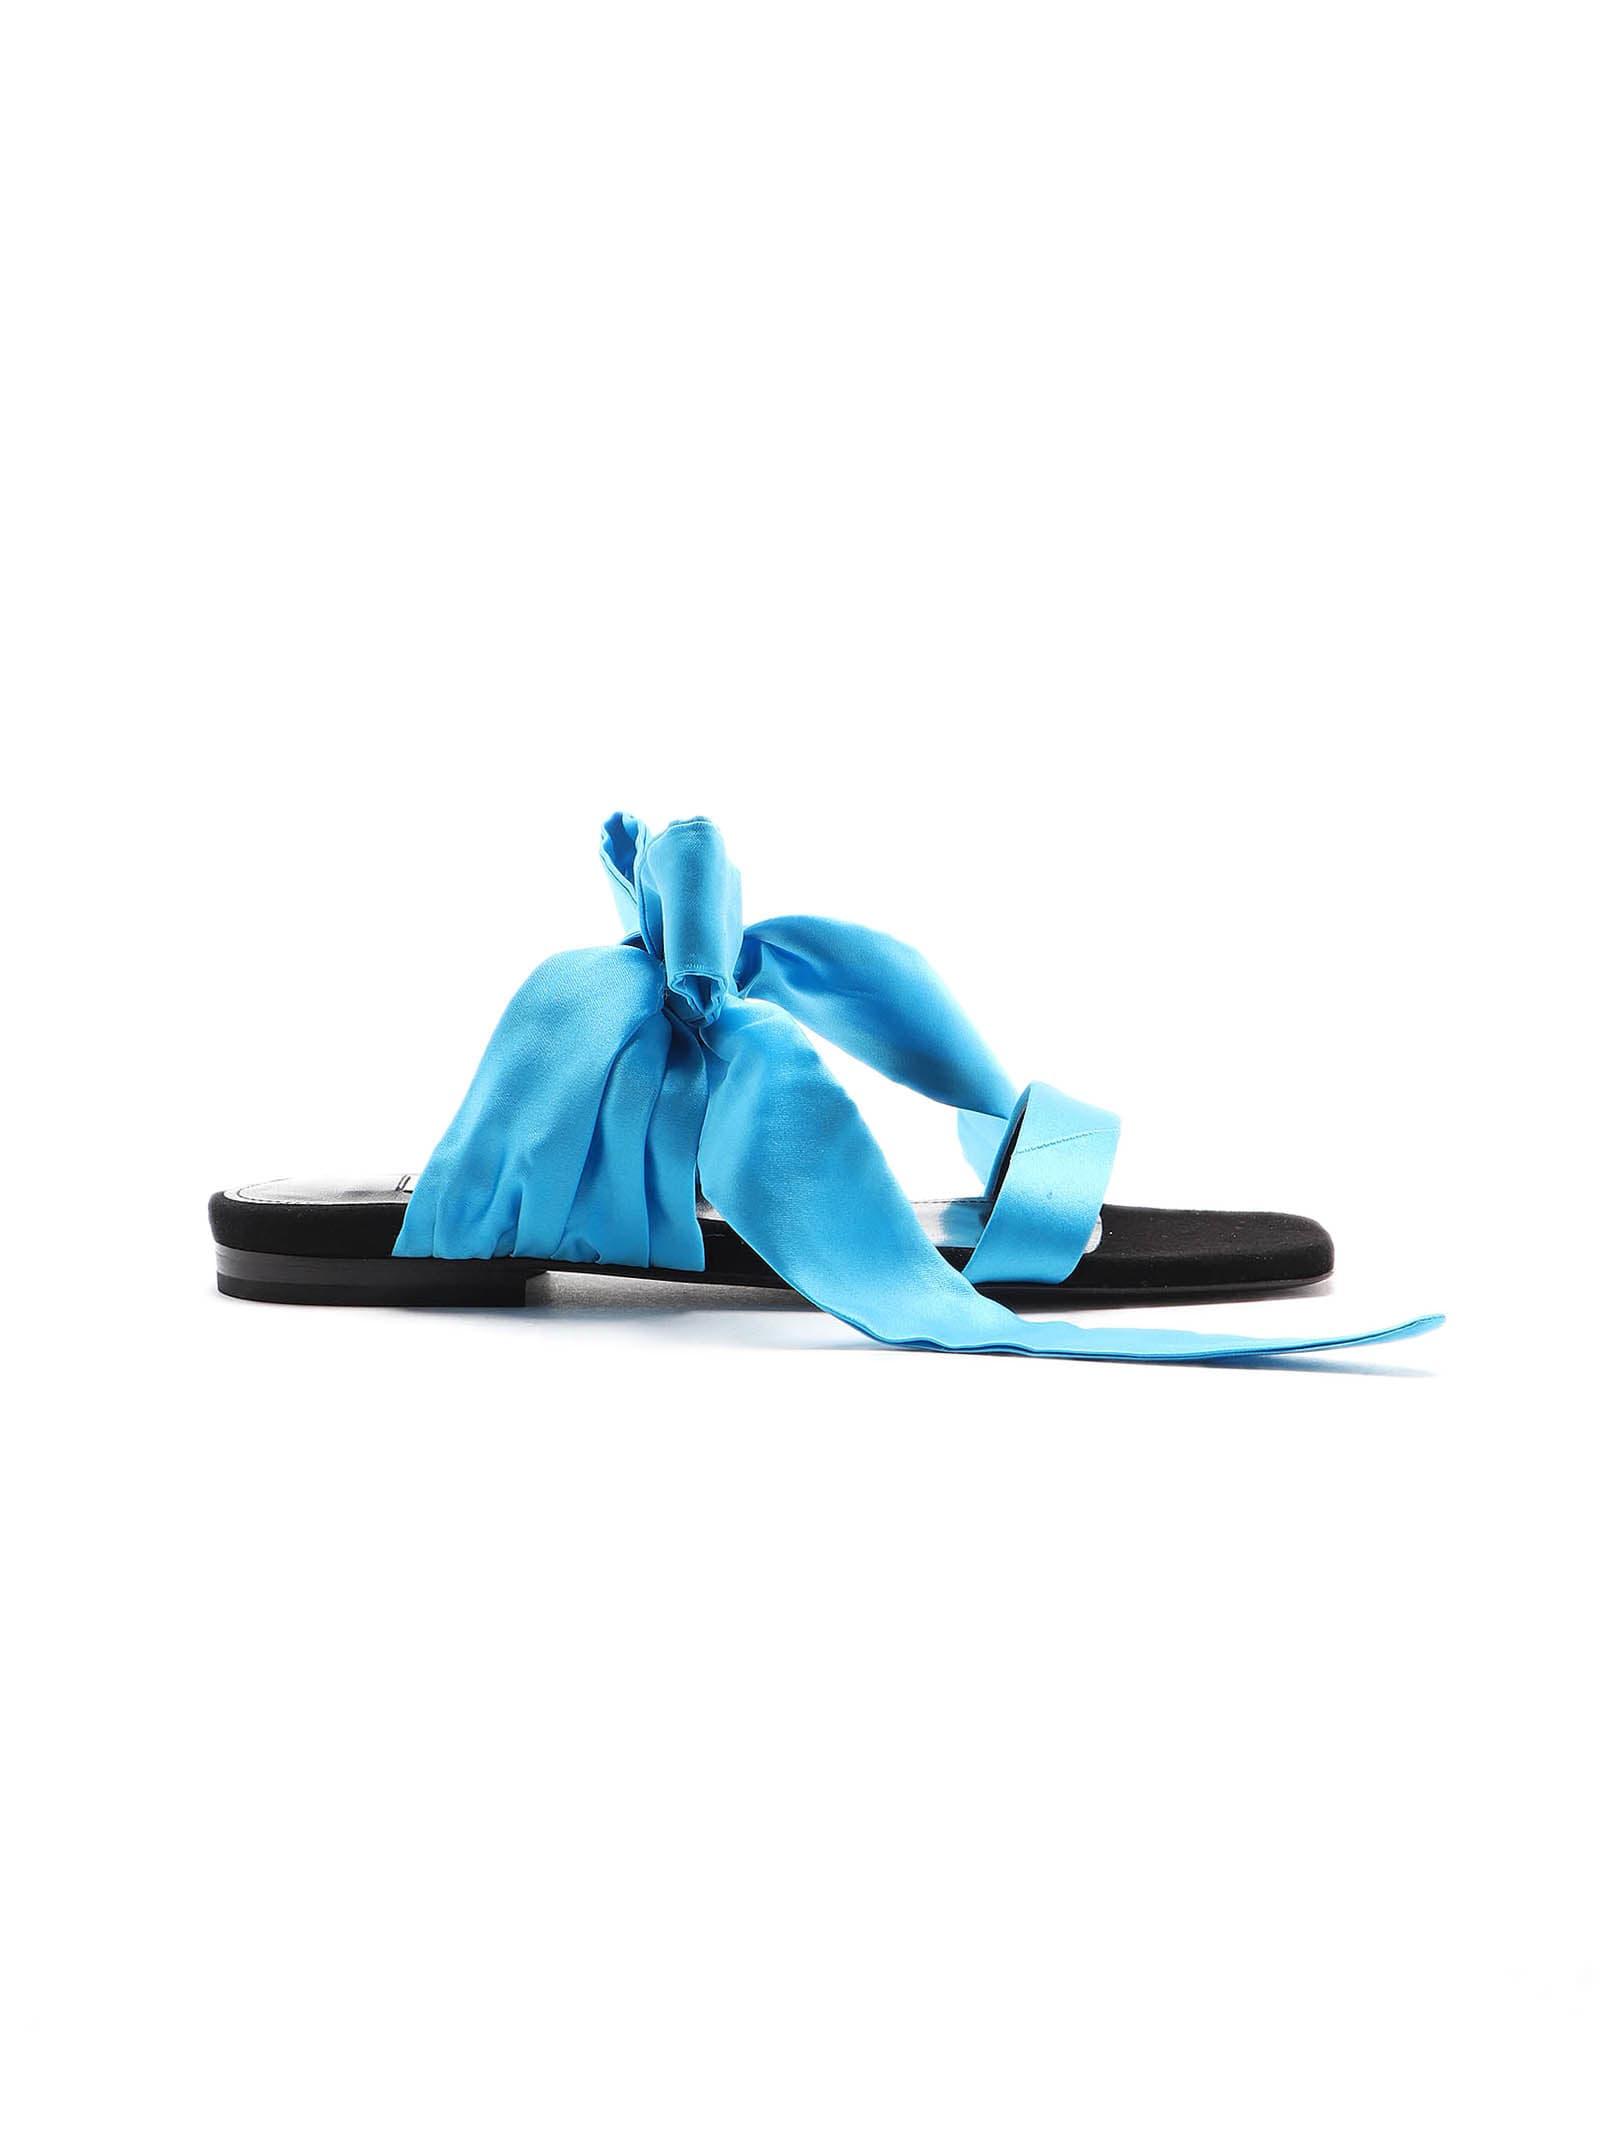 The Attico Flat Sandal